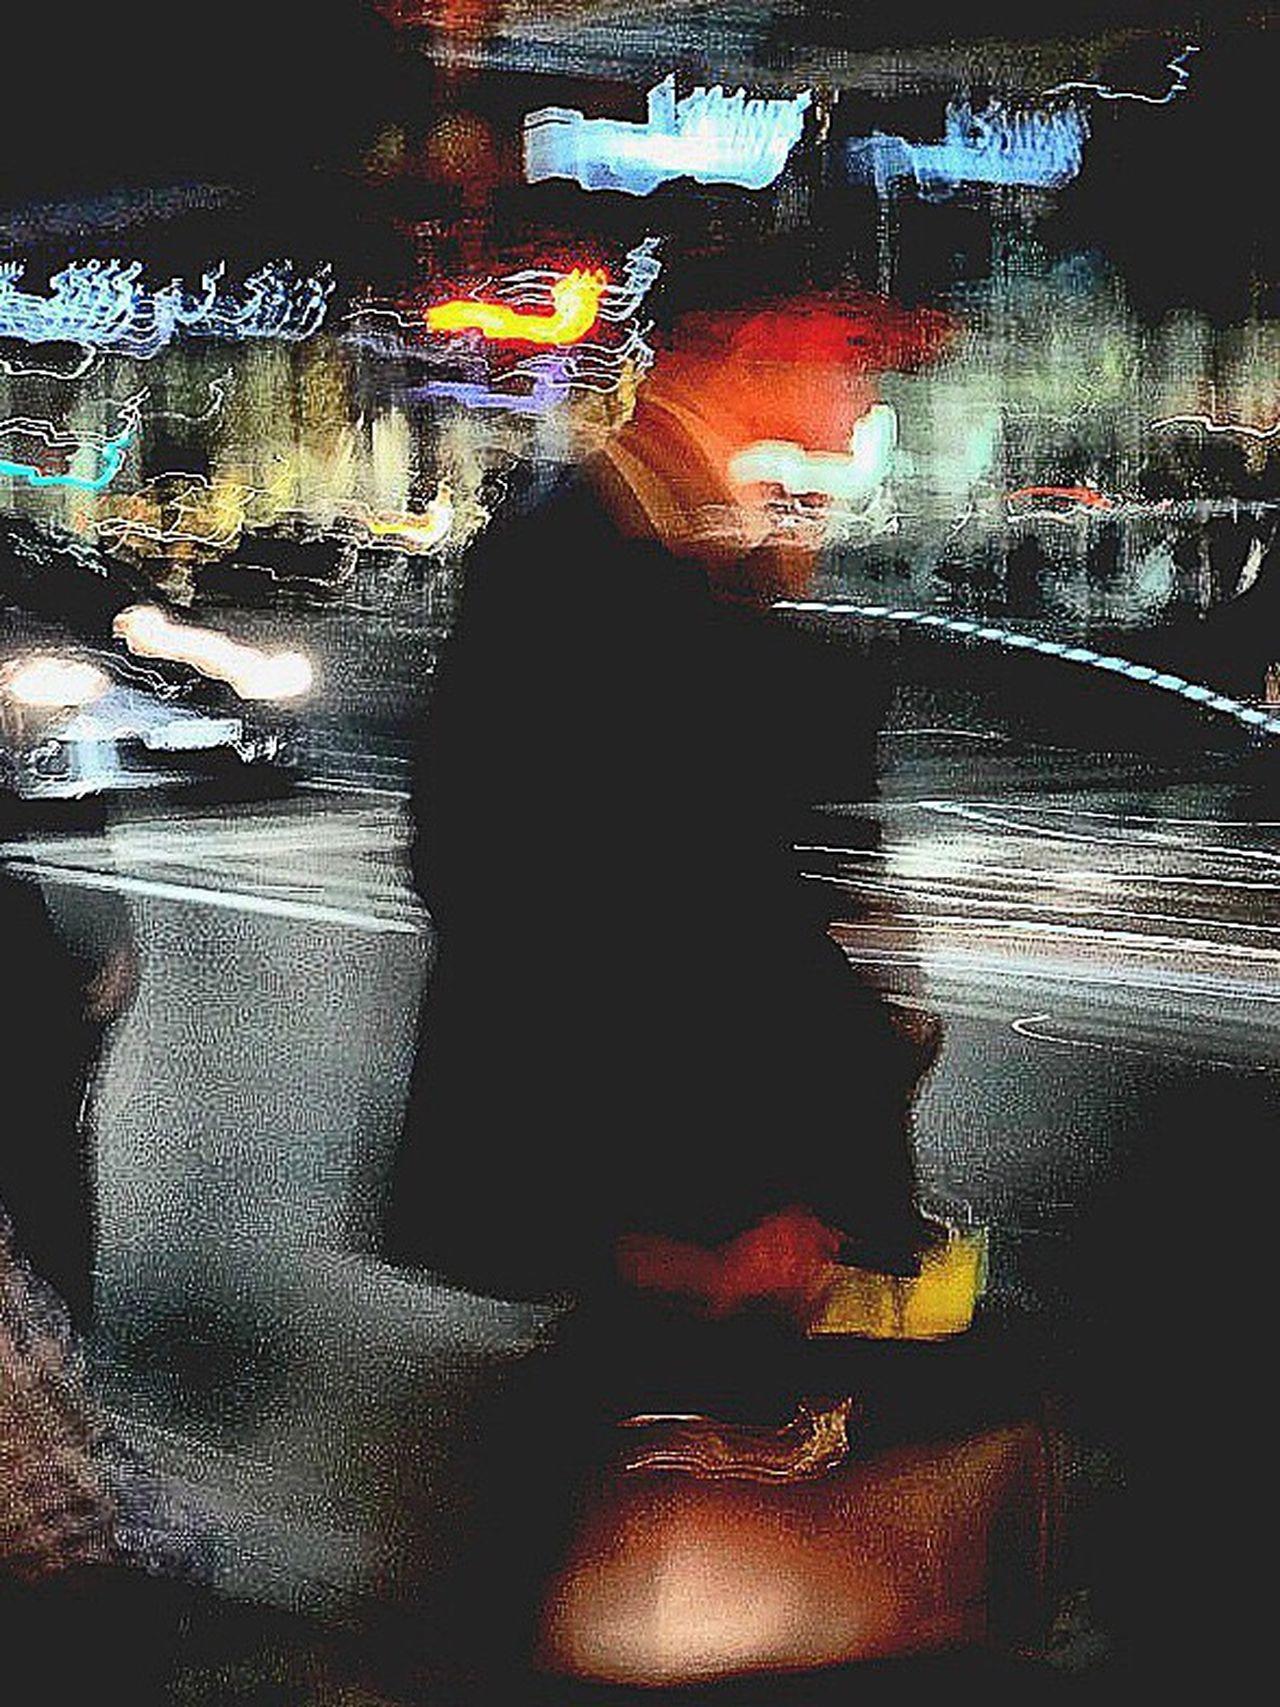 Streetphotography Street Photography Street Urban Urbanphotography Night Nightphotography Photo Photography Photooftheday Picoftheday Blurred Motion Urban Lifestyle Perth The Street Photographer - 2016 EyeEm Awards